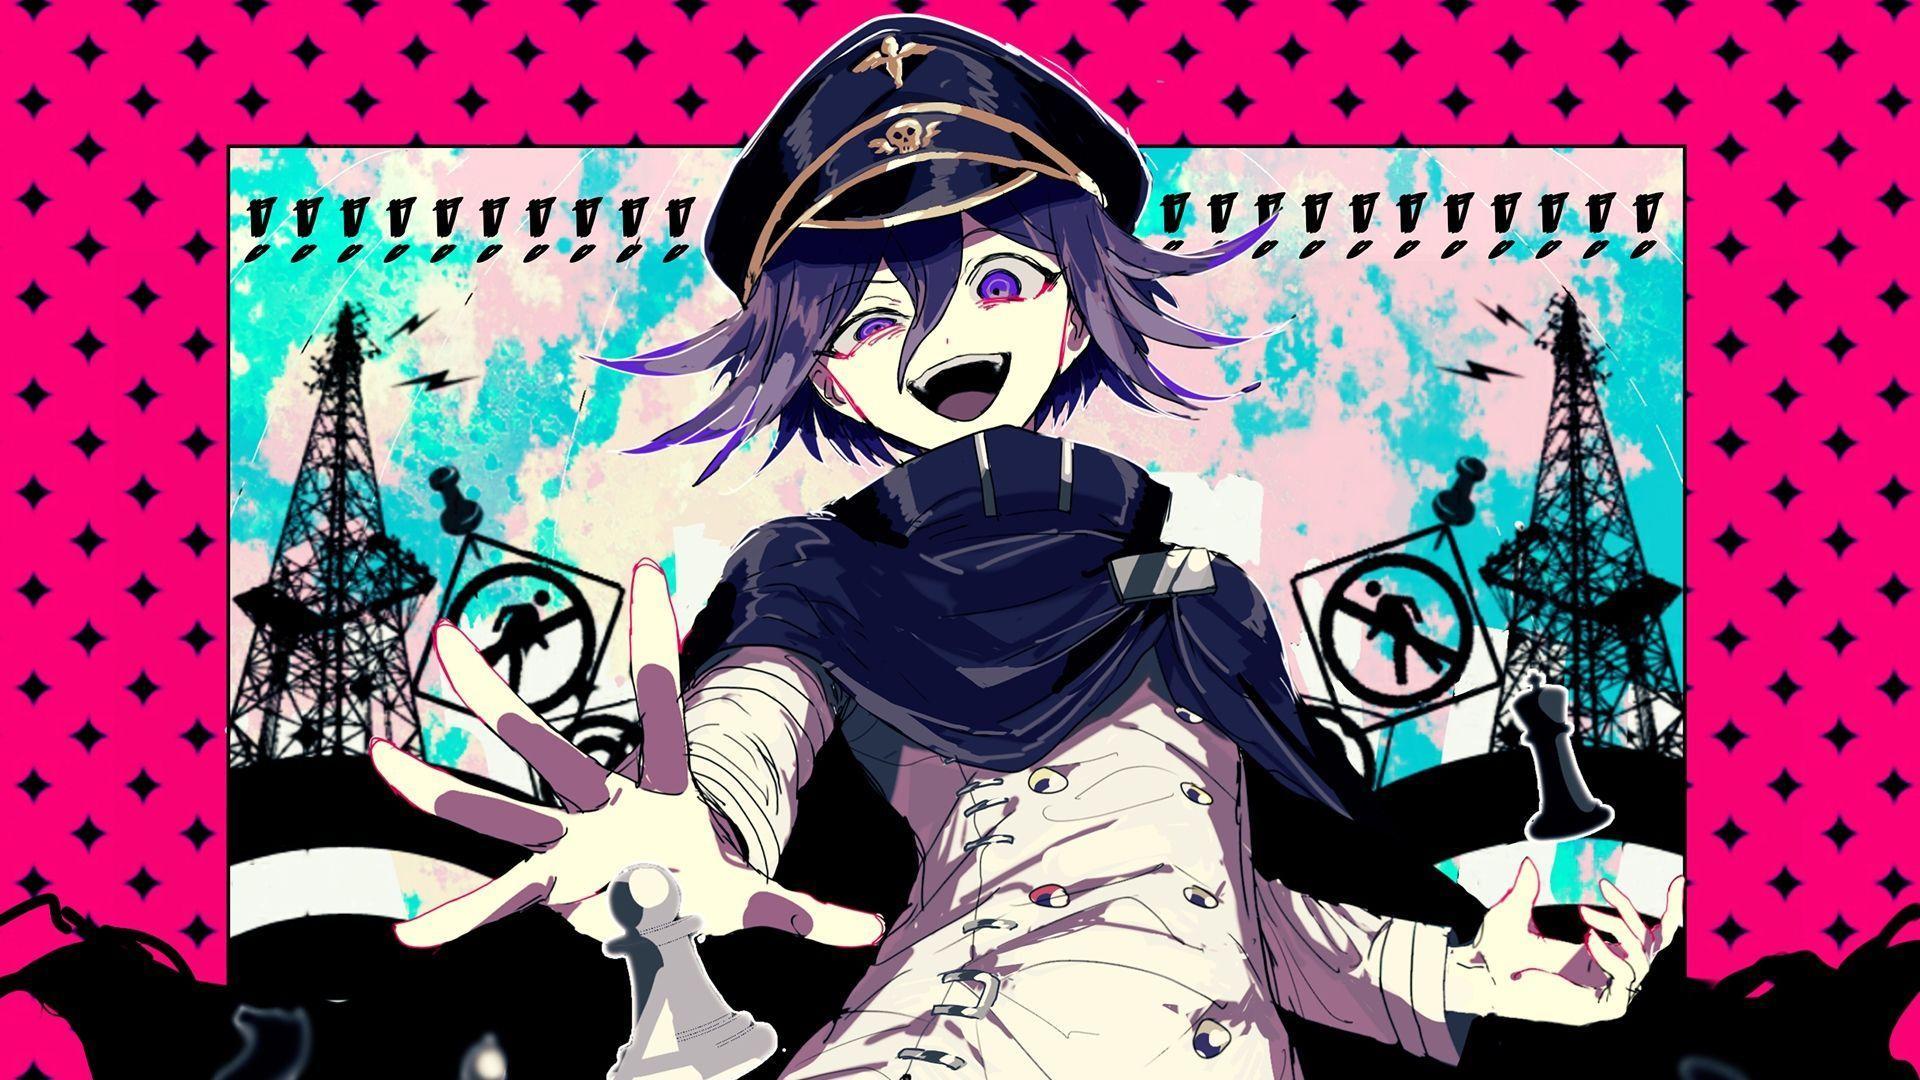 Kokichi Oma Wallpapers - Top Free Kokichi Oma Backgrounds ...